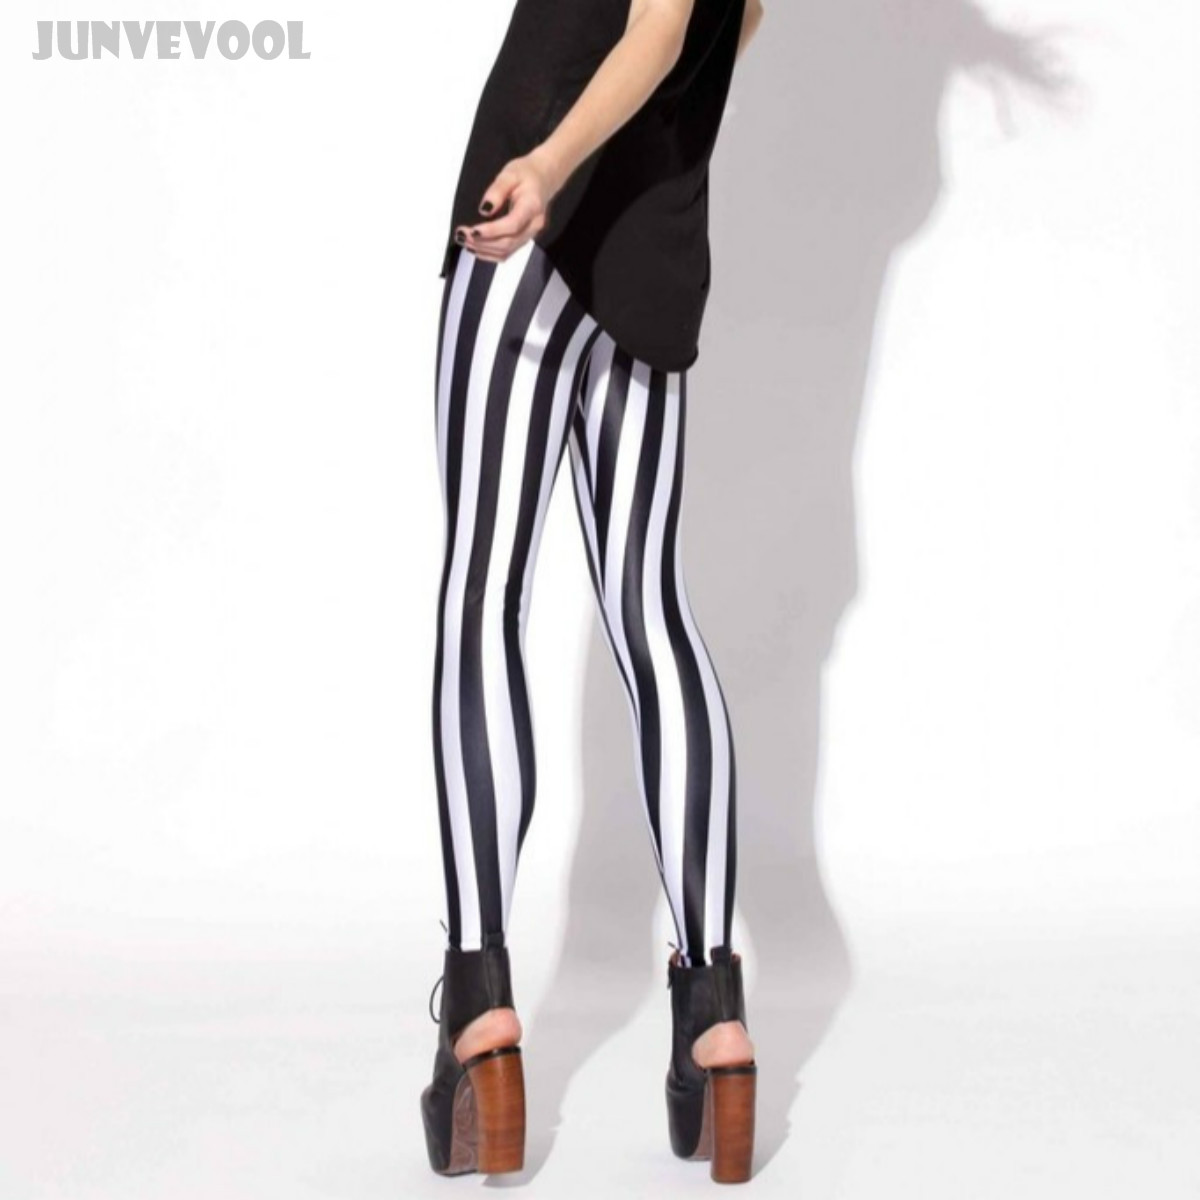 Activewear Womens High Waist Leggings Stretch Vertical Stripes Print Pants 3D Black White Patchwork Slim Trousers Plus Size 4XL 2